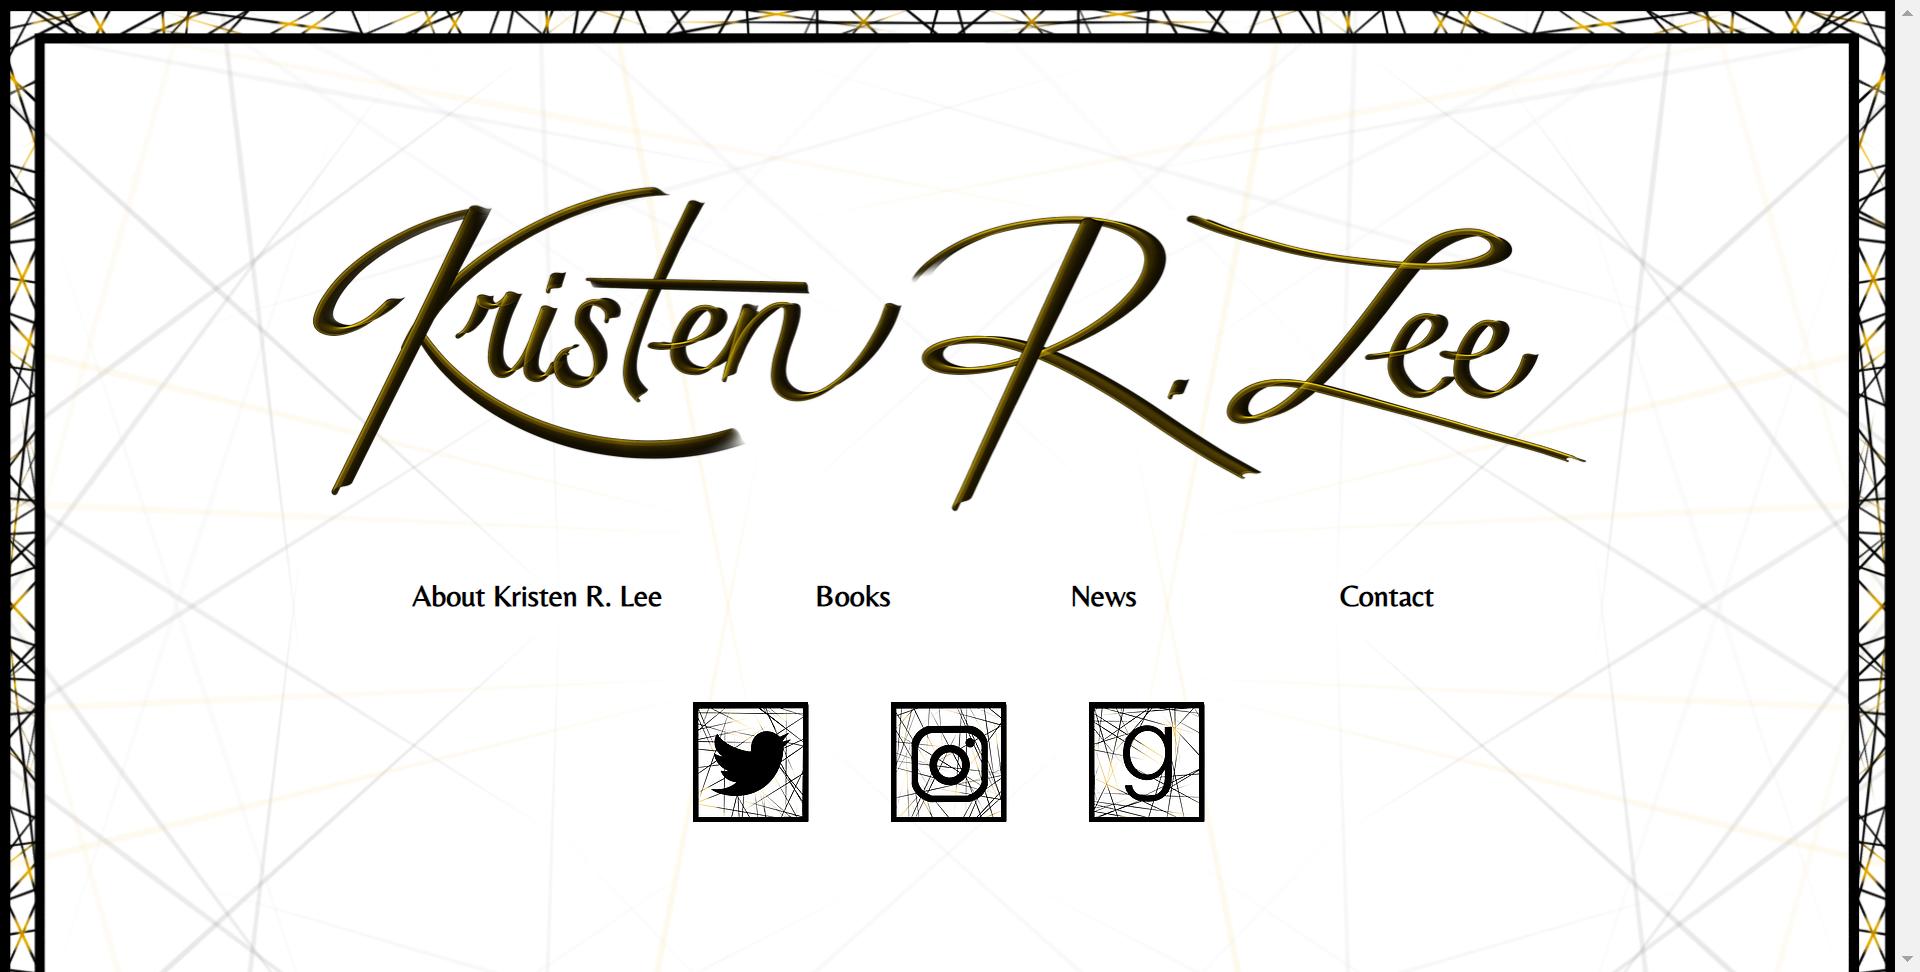 Kristen R. Lee Books